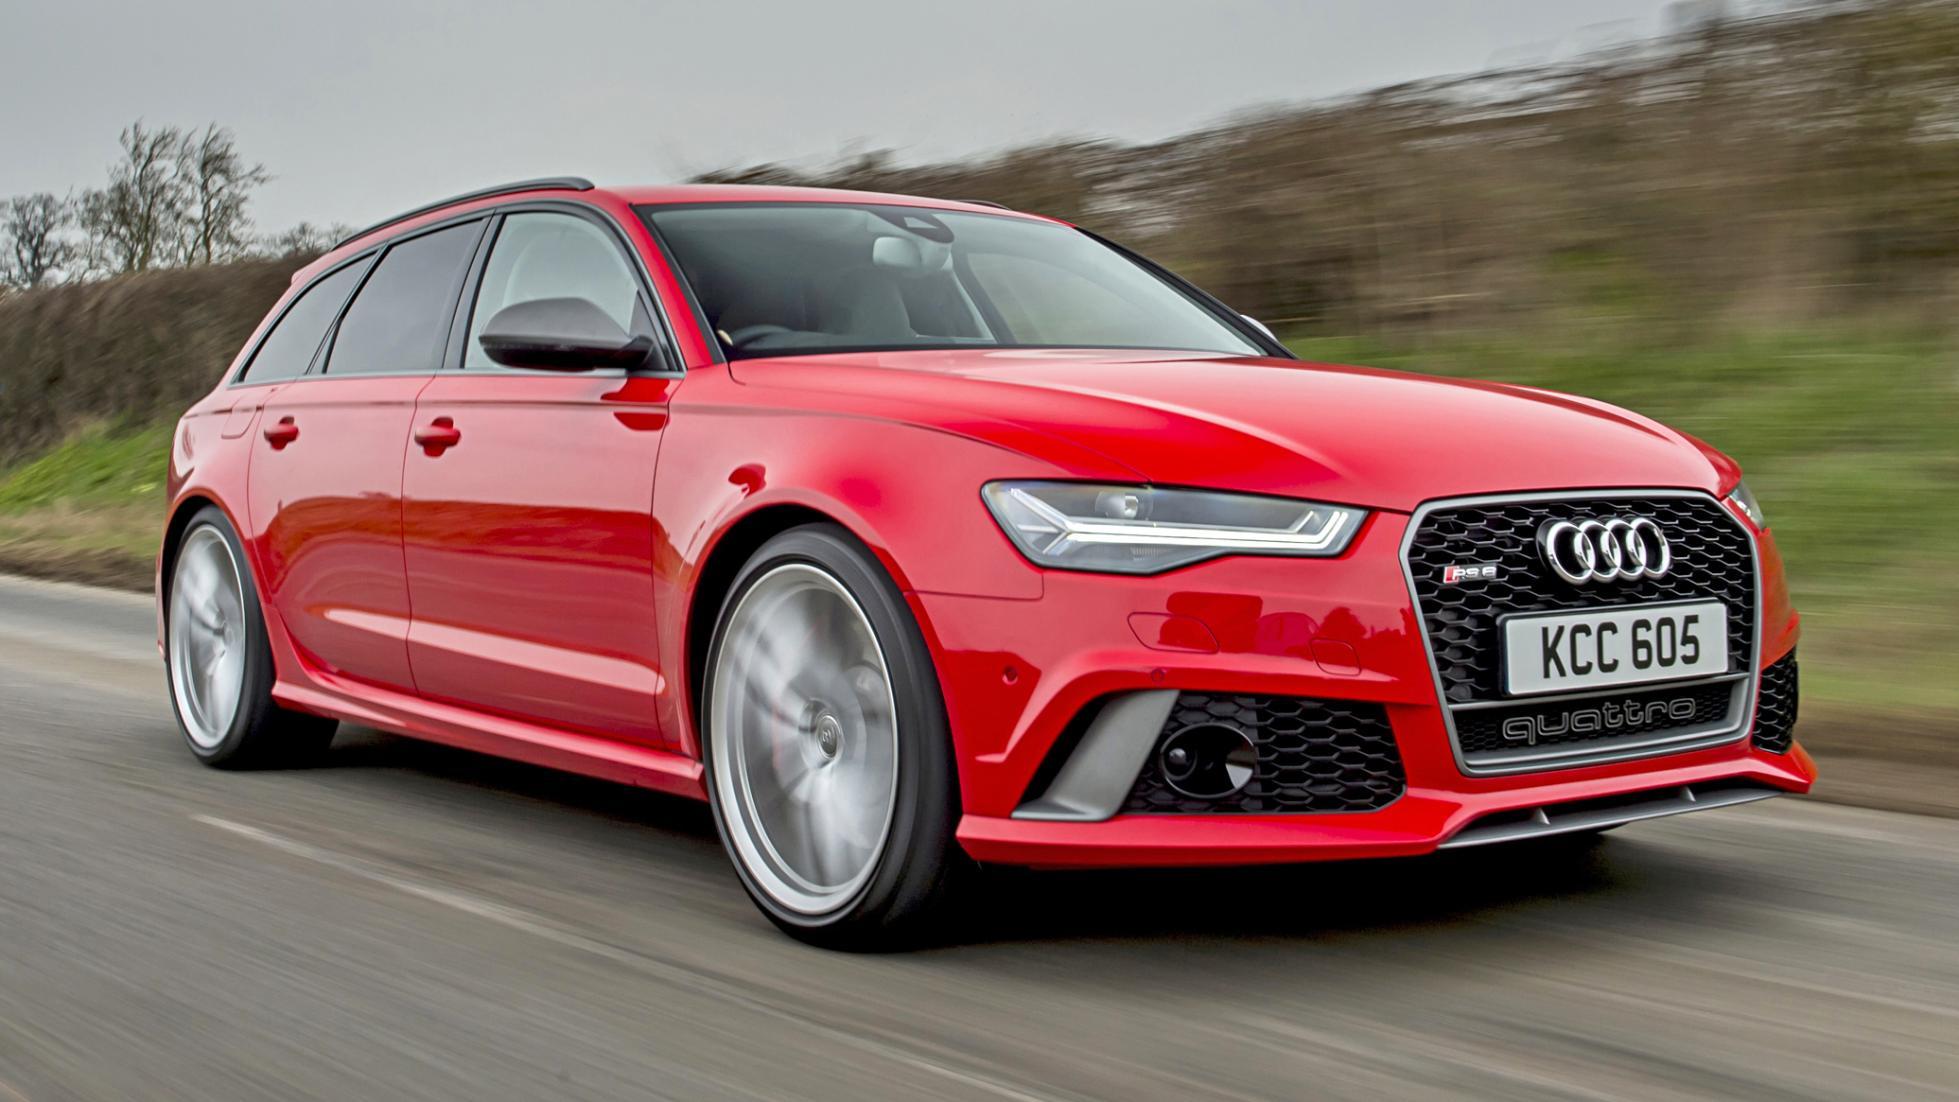 Audi RS6 avant red front quarter